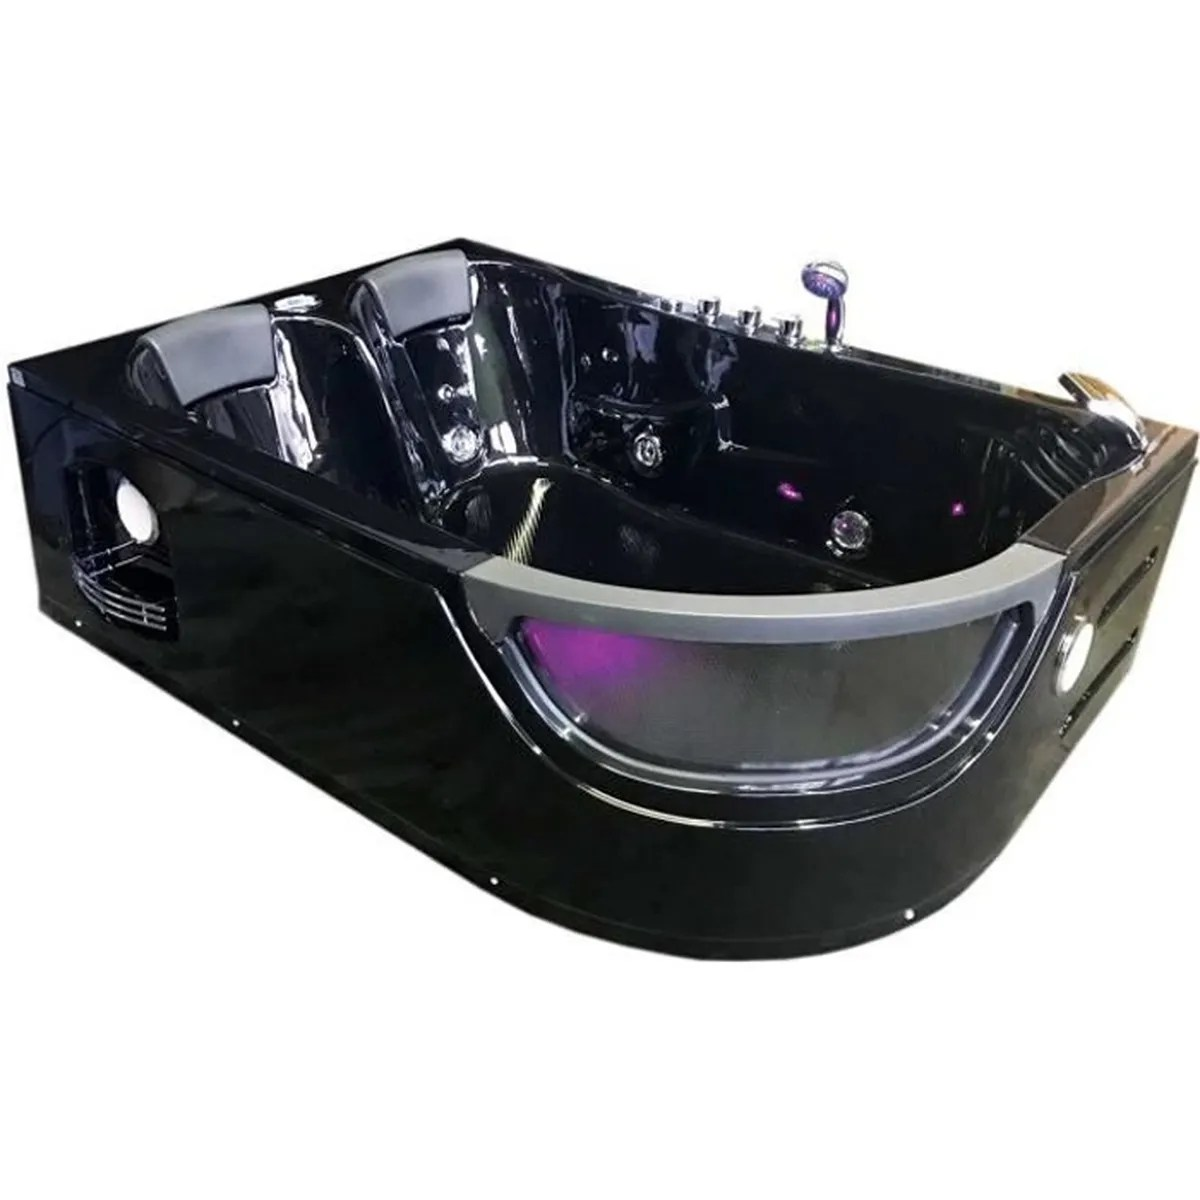 baignoire kit balneo baignoire balneo bain pegaso balneo angle tourbill